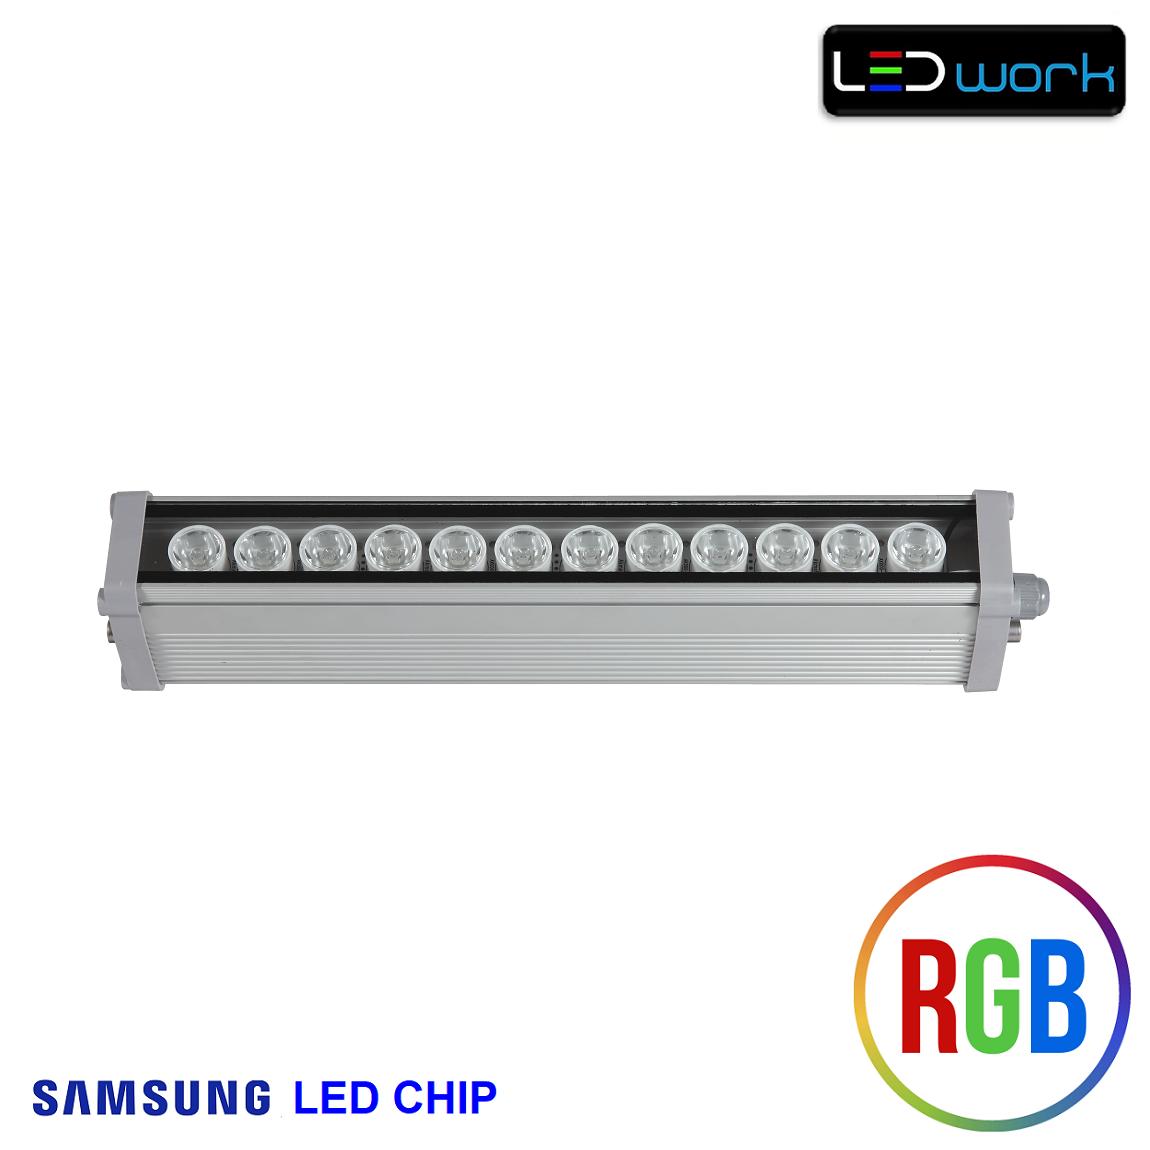 35 cm 12 Watt SAMSUNG LED Chip Sıva Üstü RGB Wallwasher